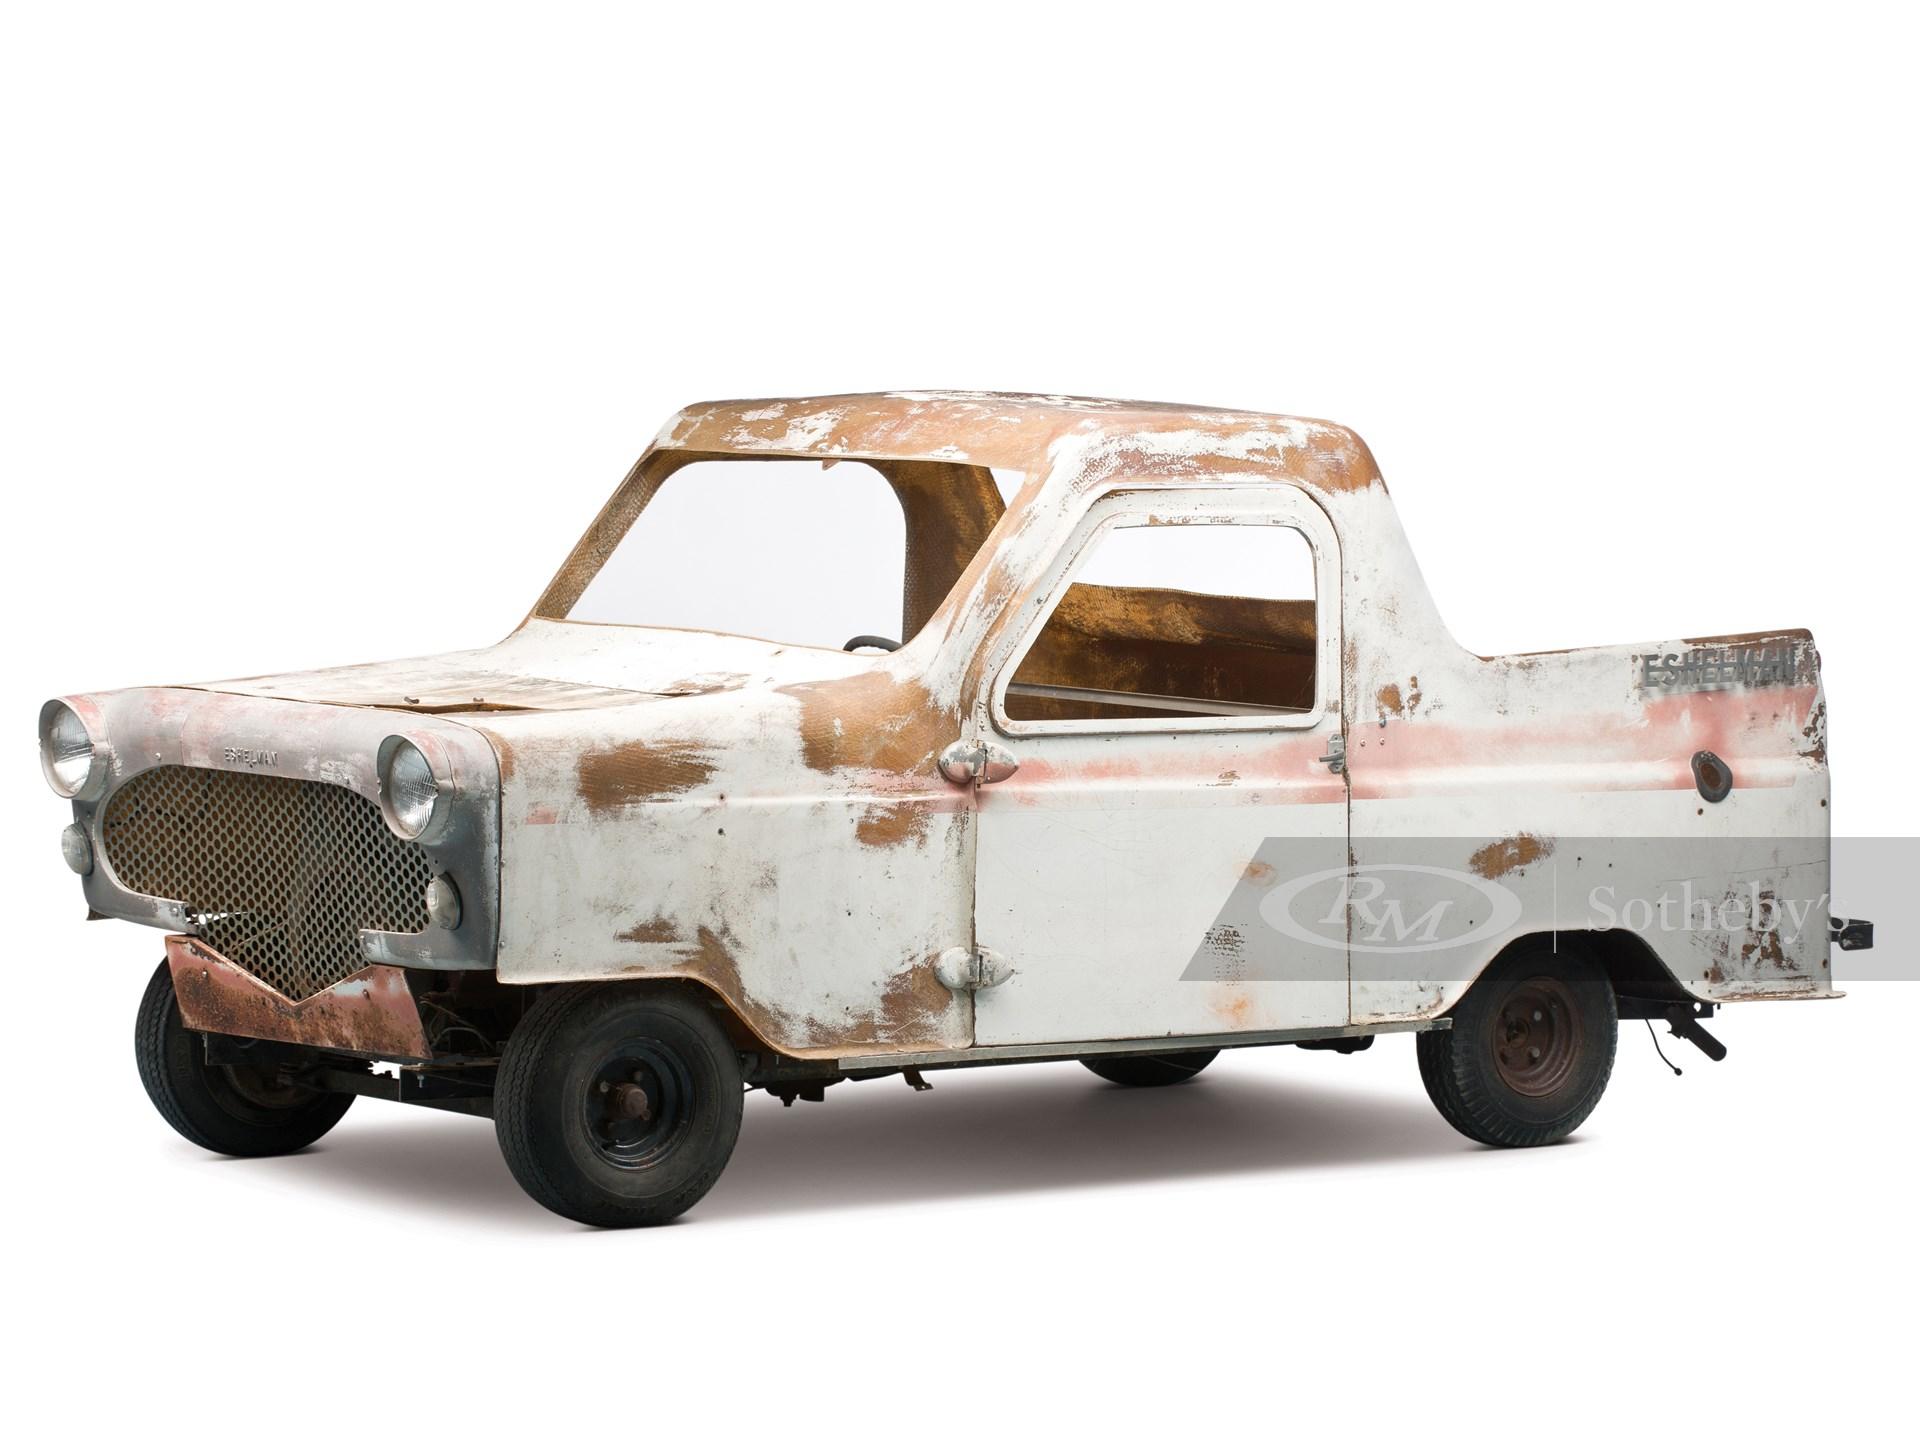 1958 Eshelman Sportabout Coupe